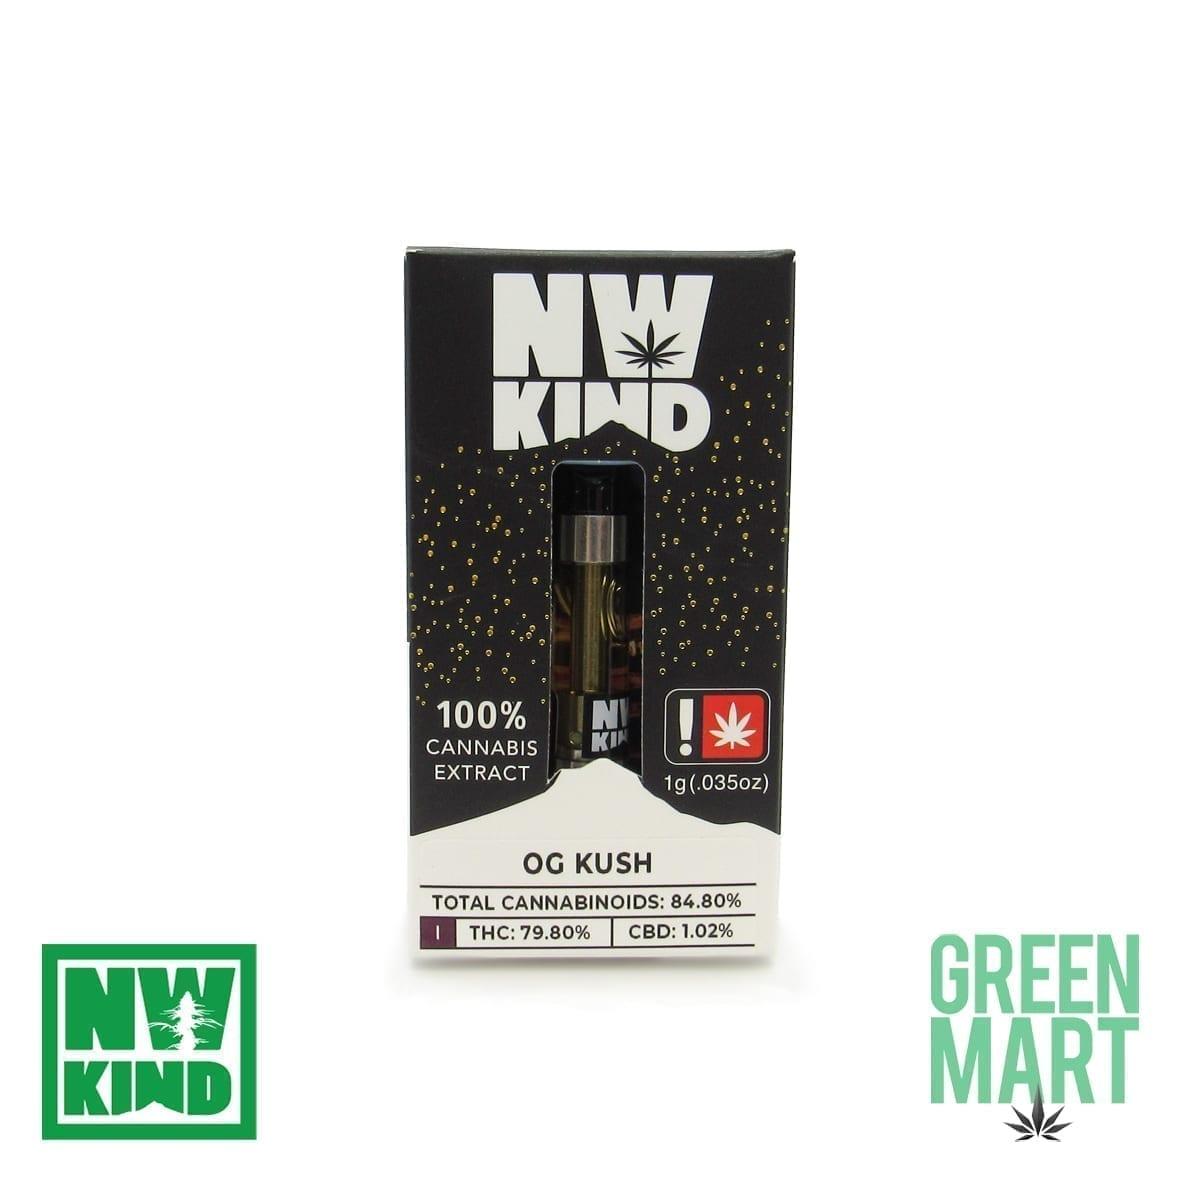 NW Kind Distillate Cartridge - OG Kush